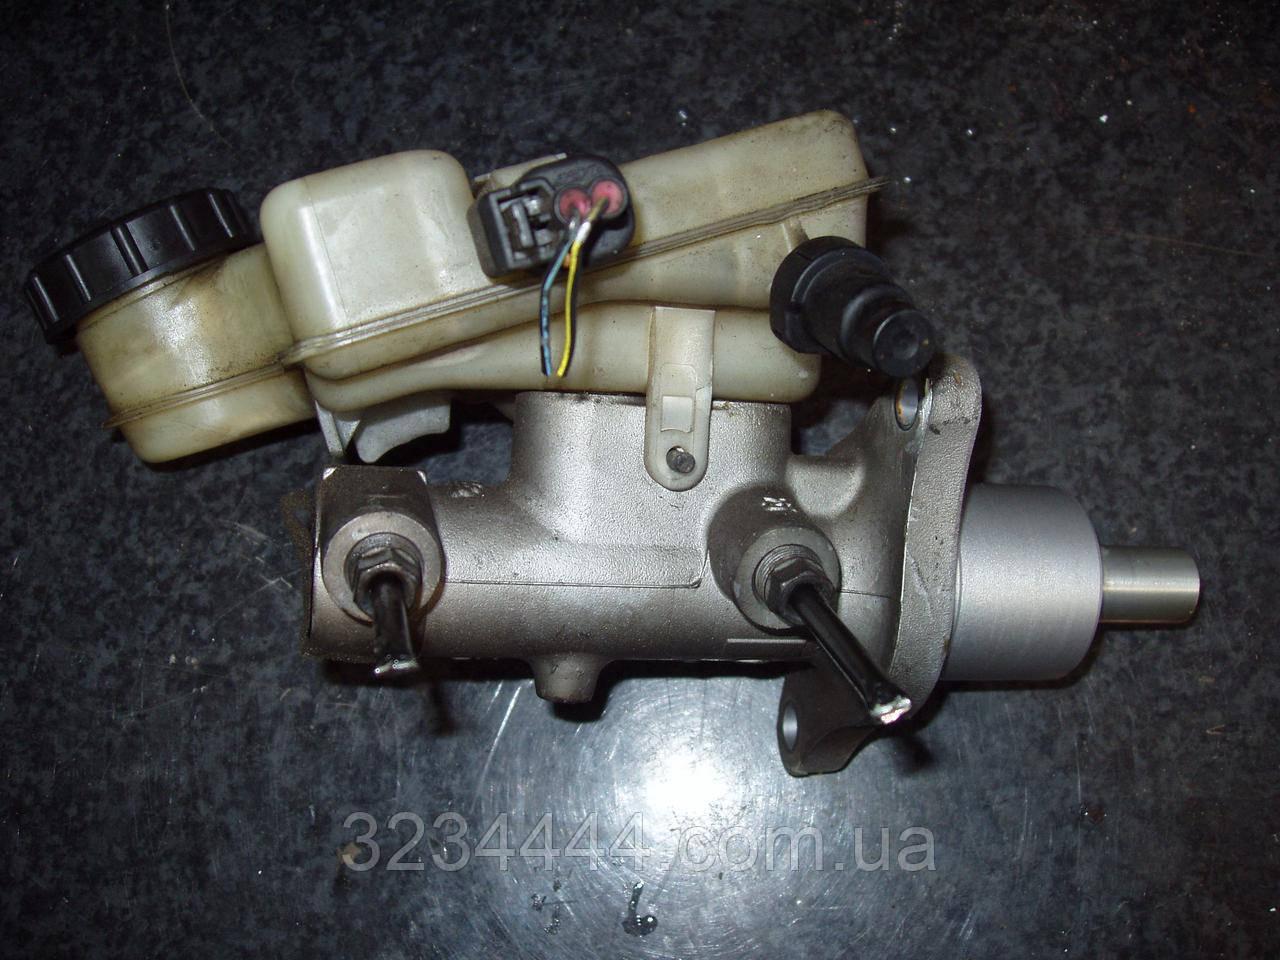 Главный тормозной цилиндр MAZDA MAZDA3 BK 03-08